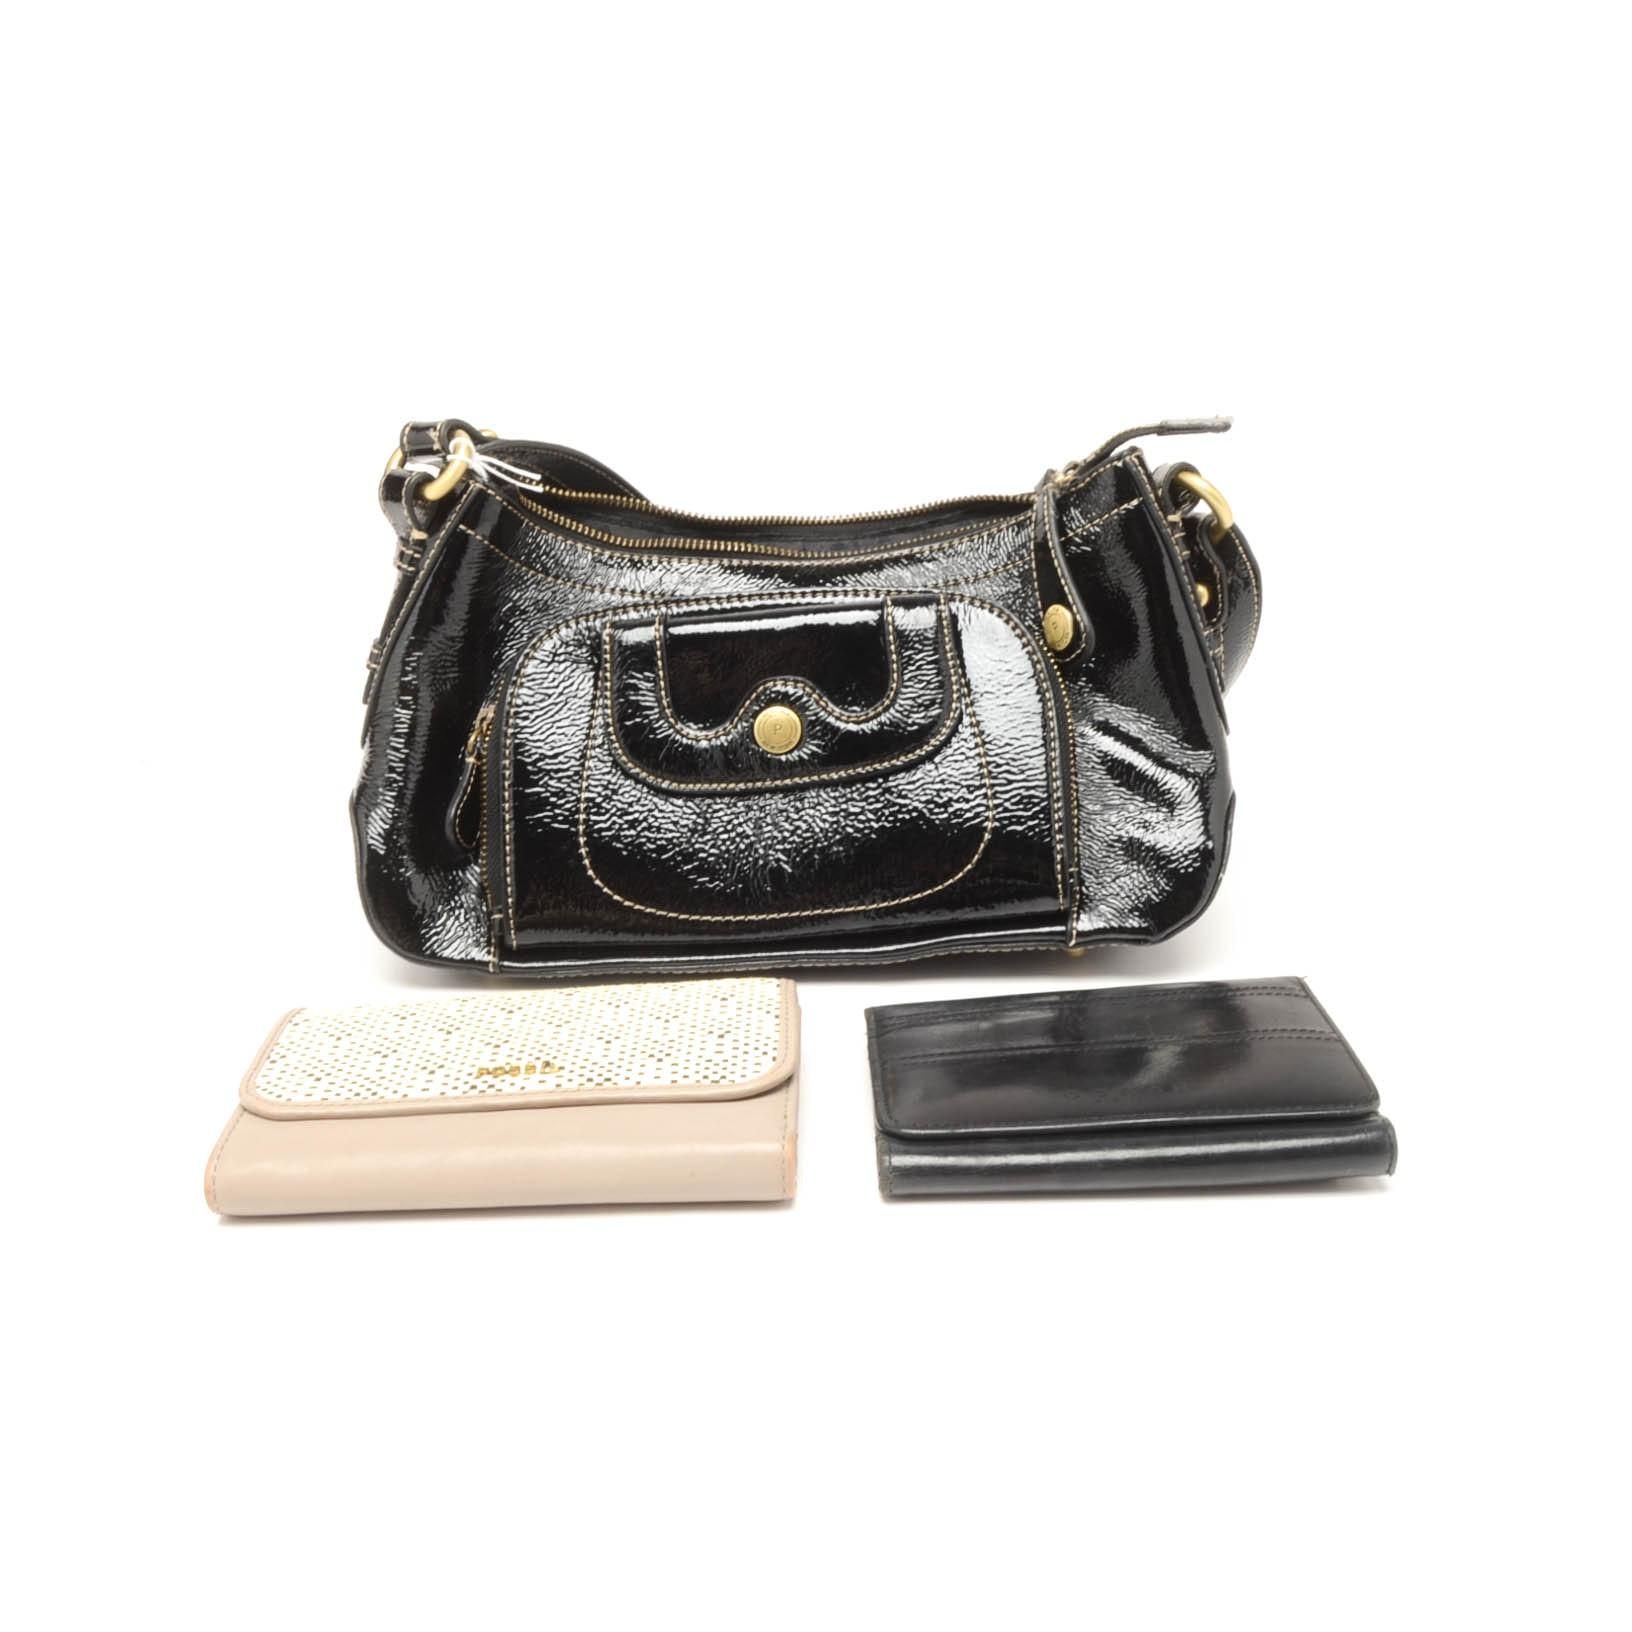 Designer Handbag and Wallets by Coach, Perlina, and Tignanello